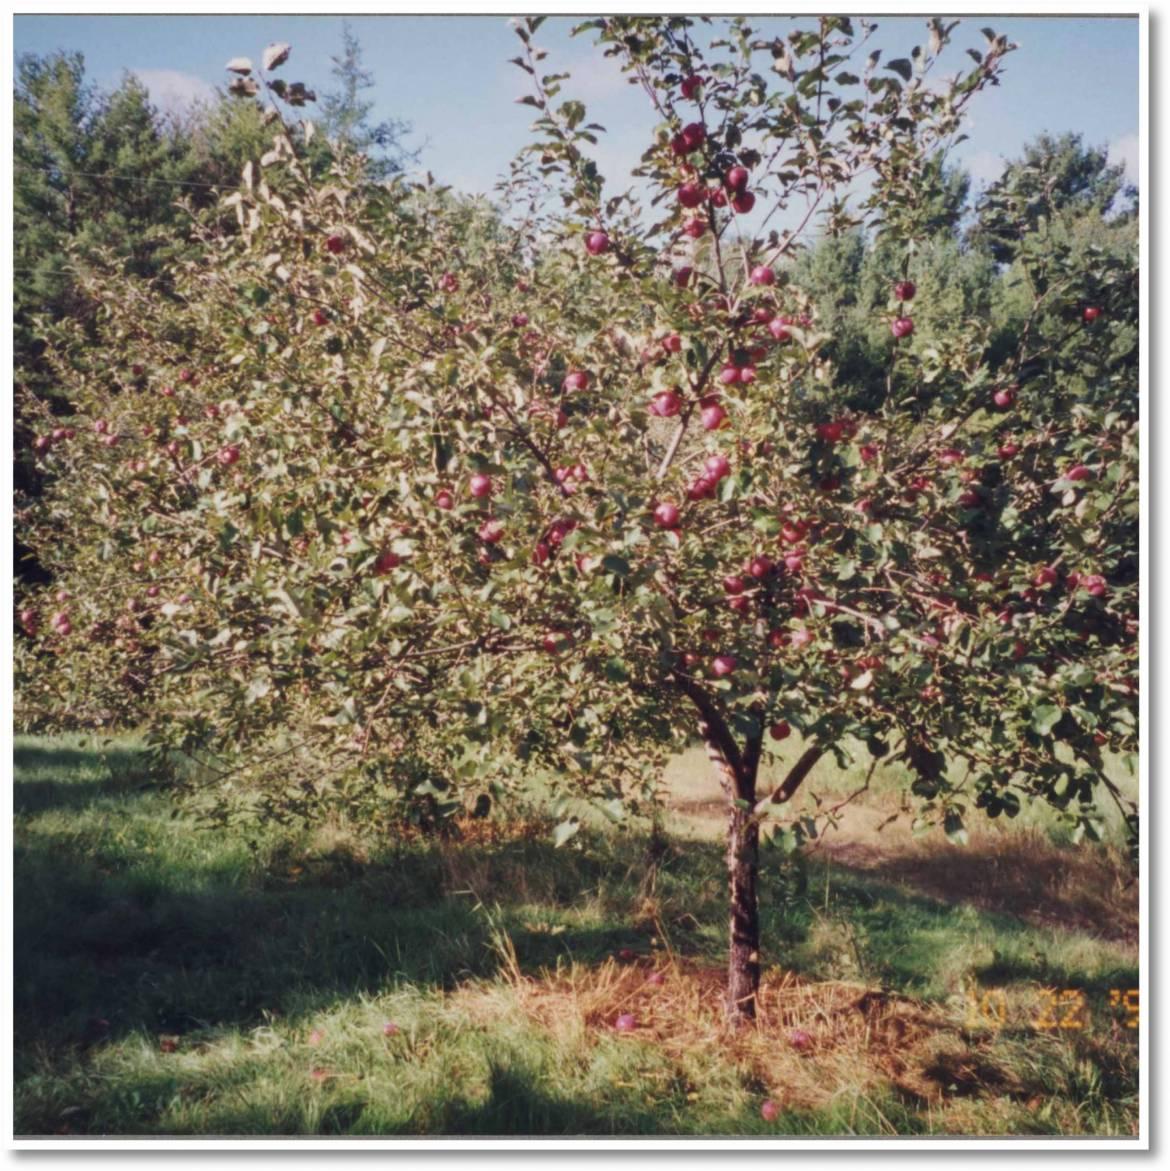 loaded-apples-for-harvest-scaled.jpg